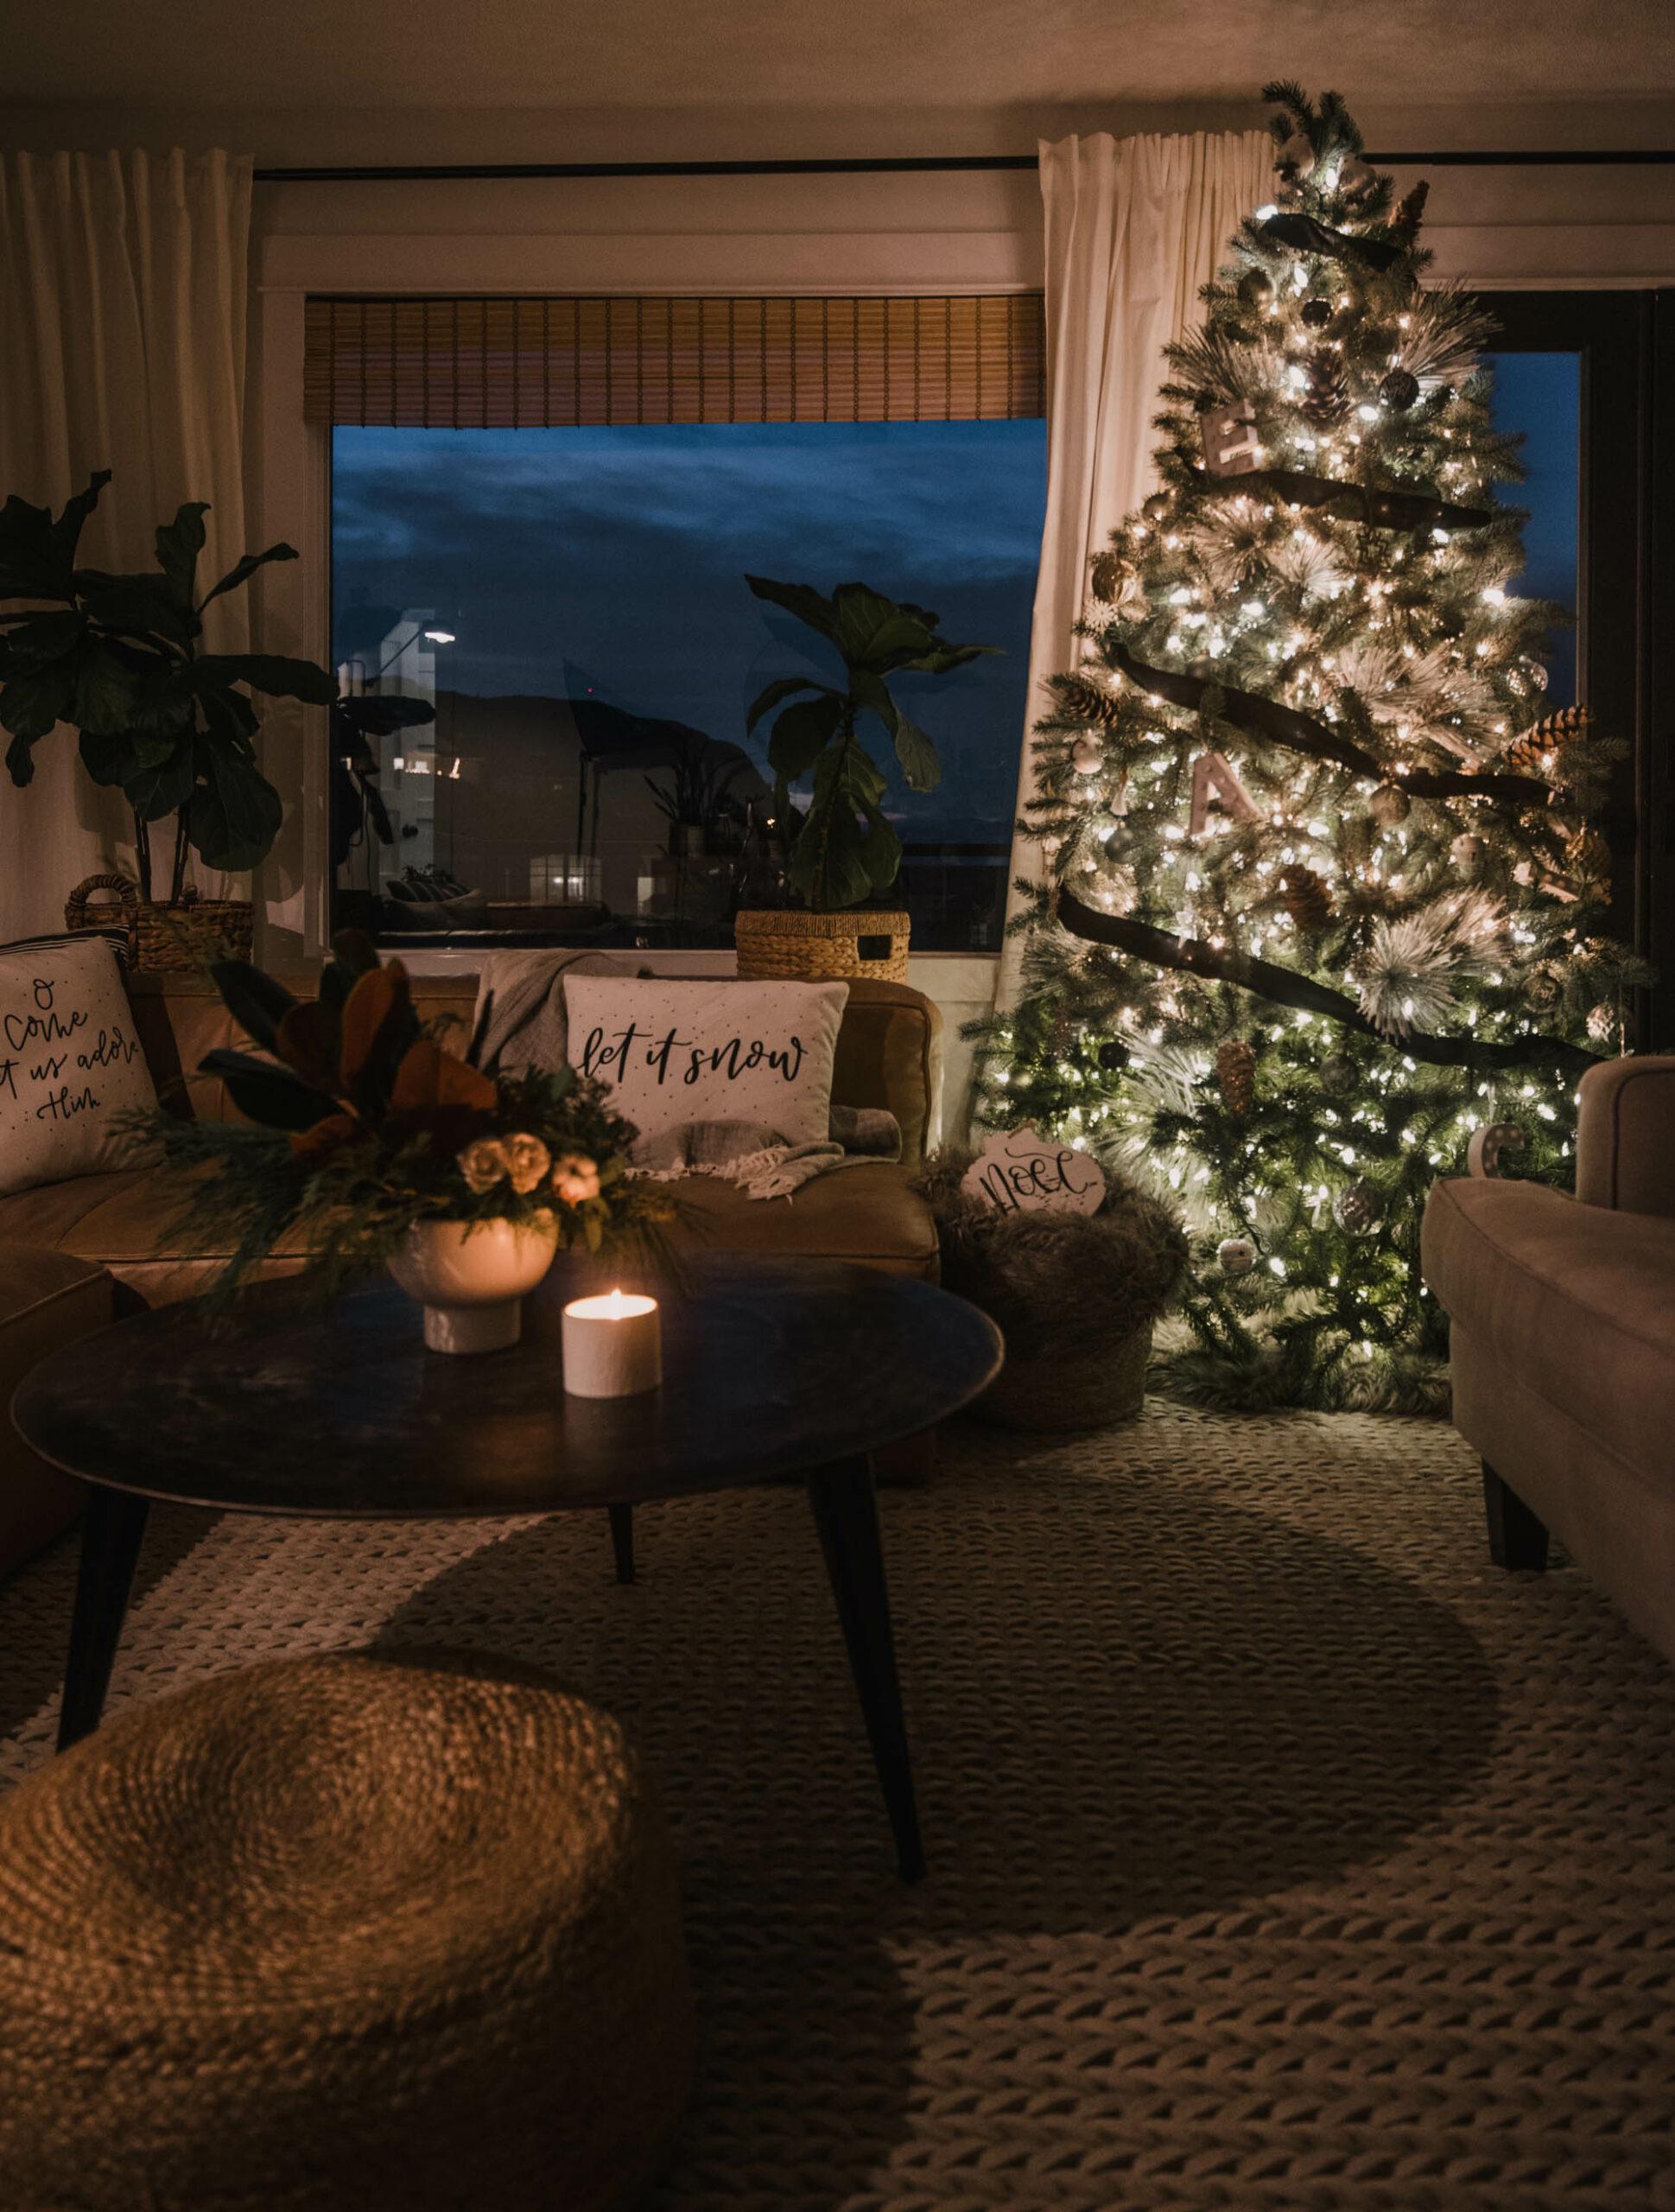 Holiday Home Decor at Night